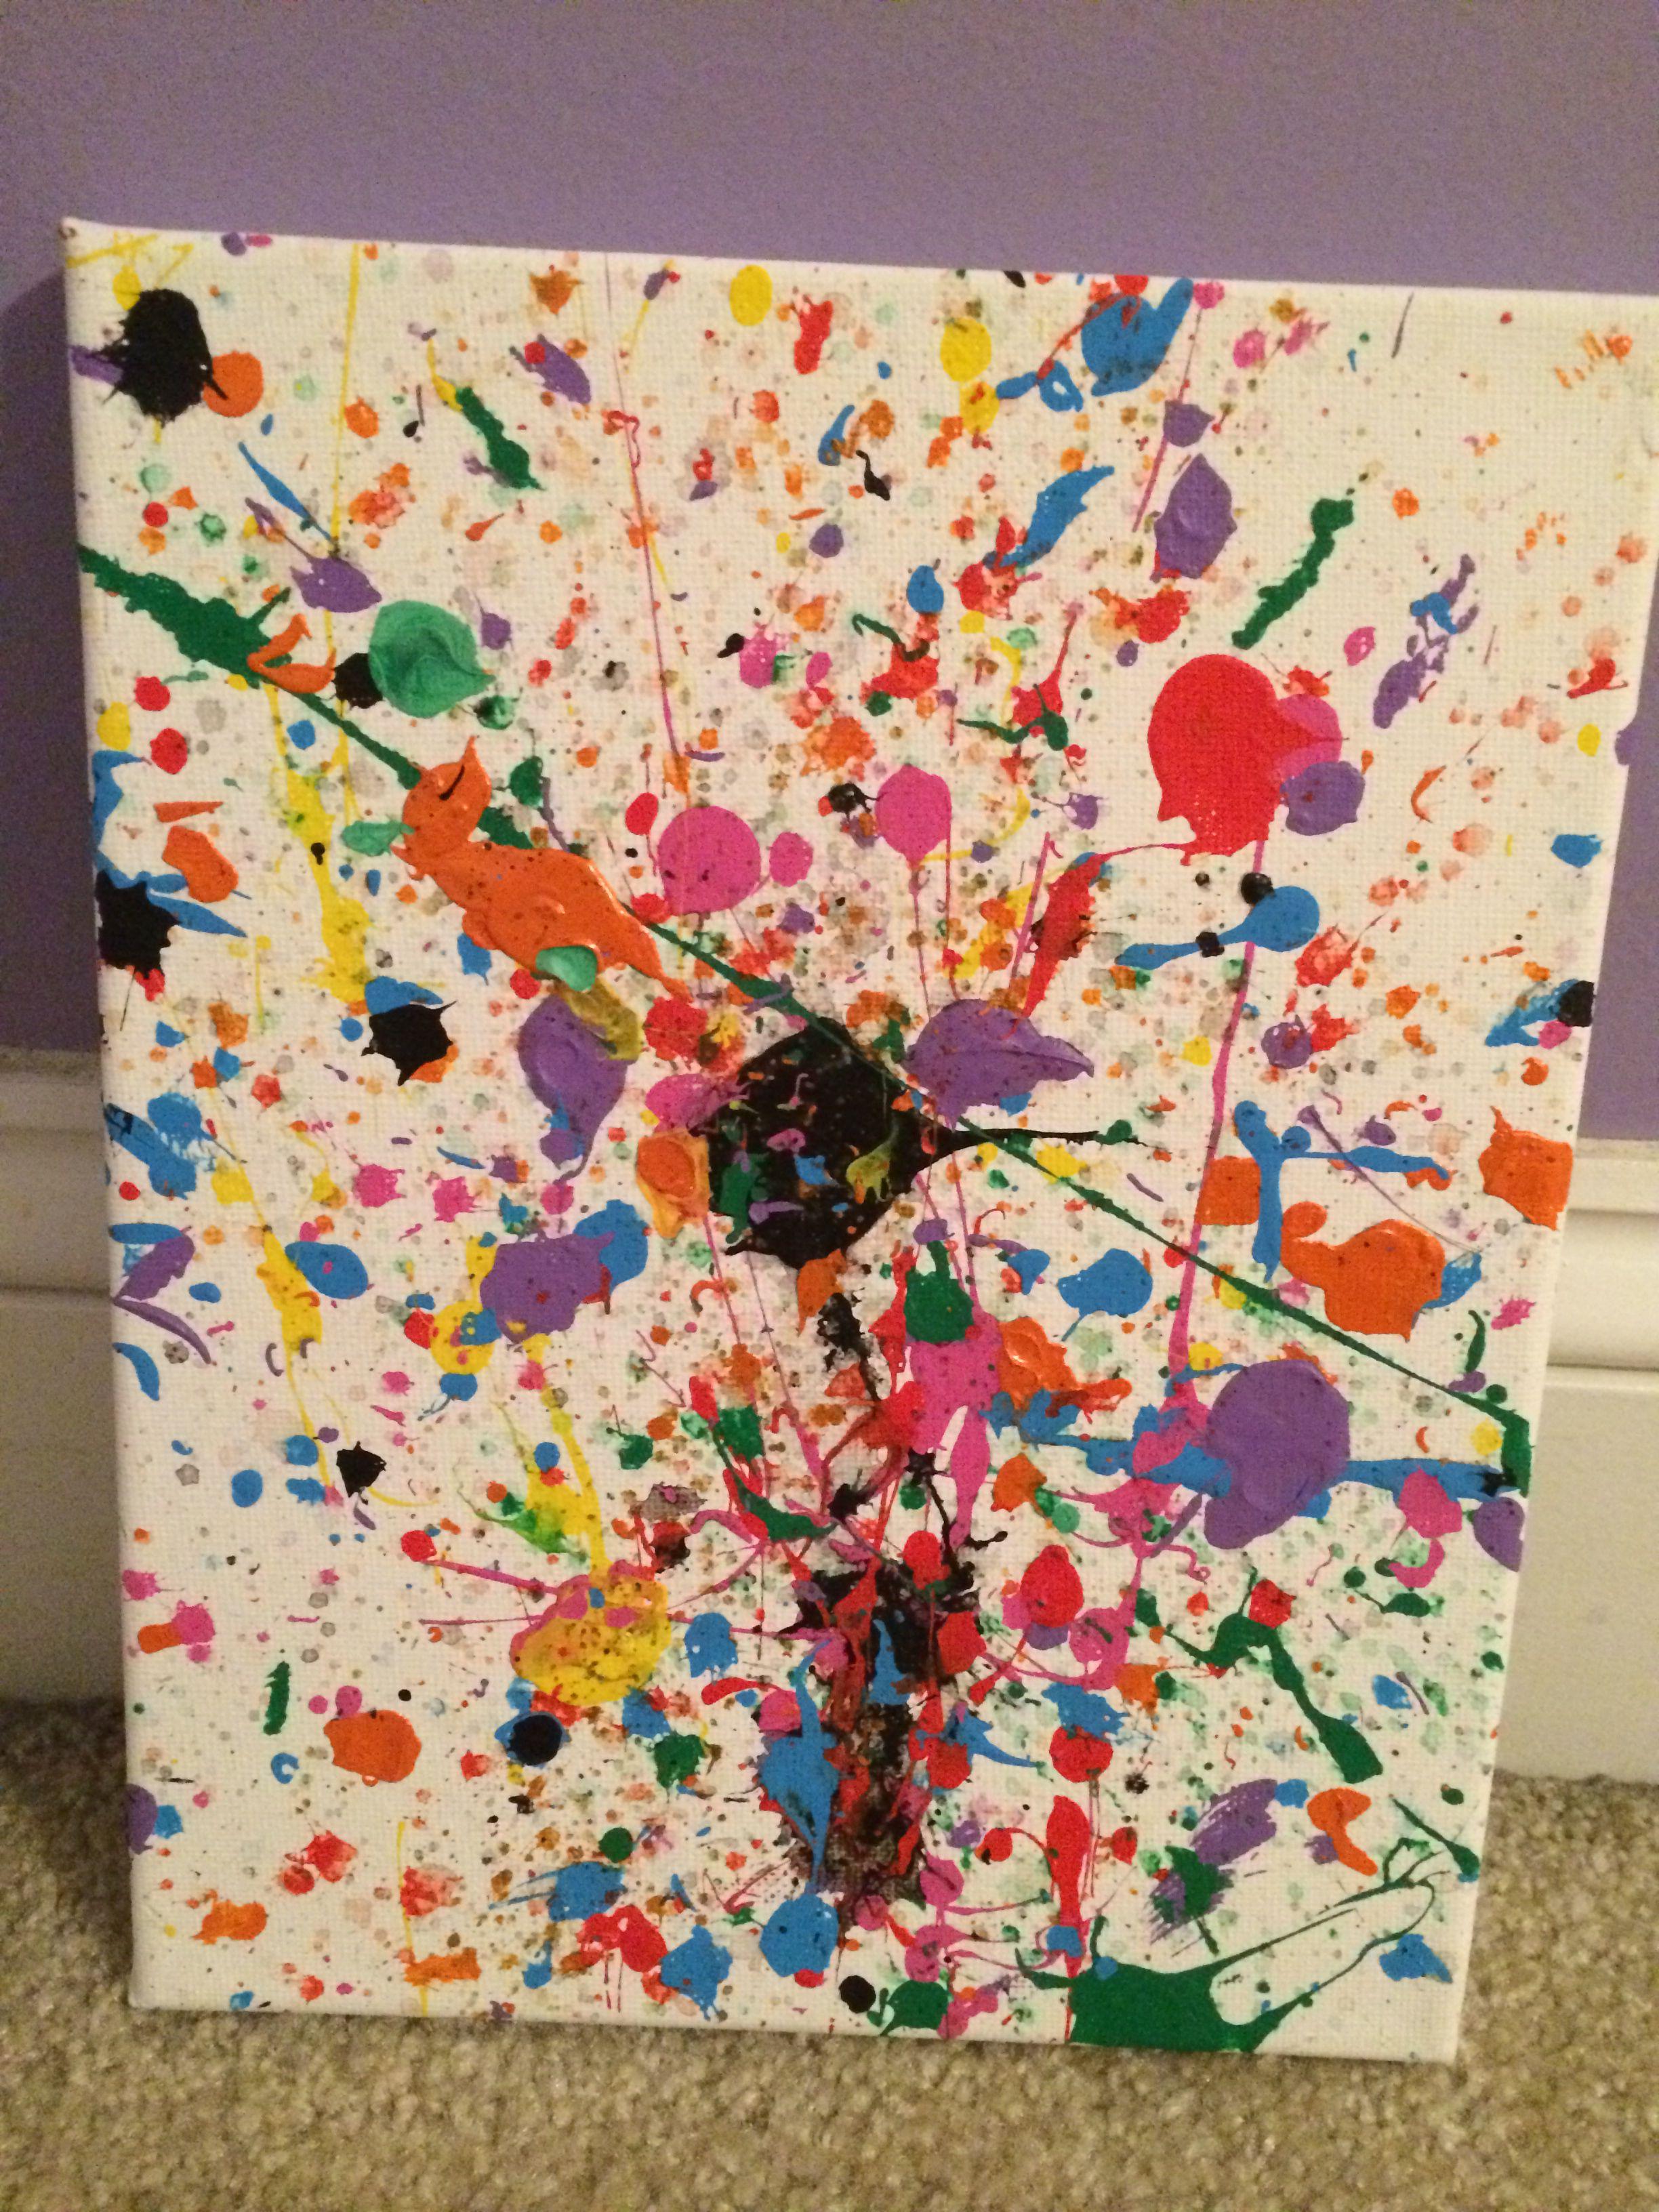 Splatter paint canvas art